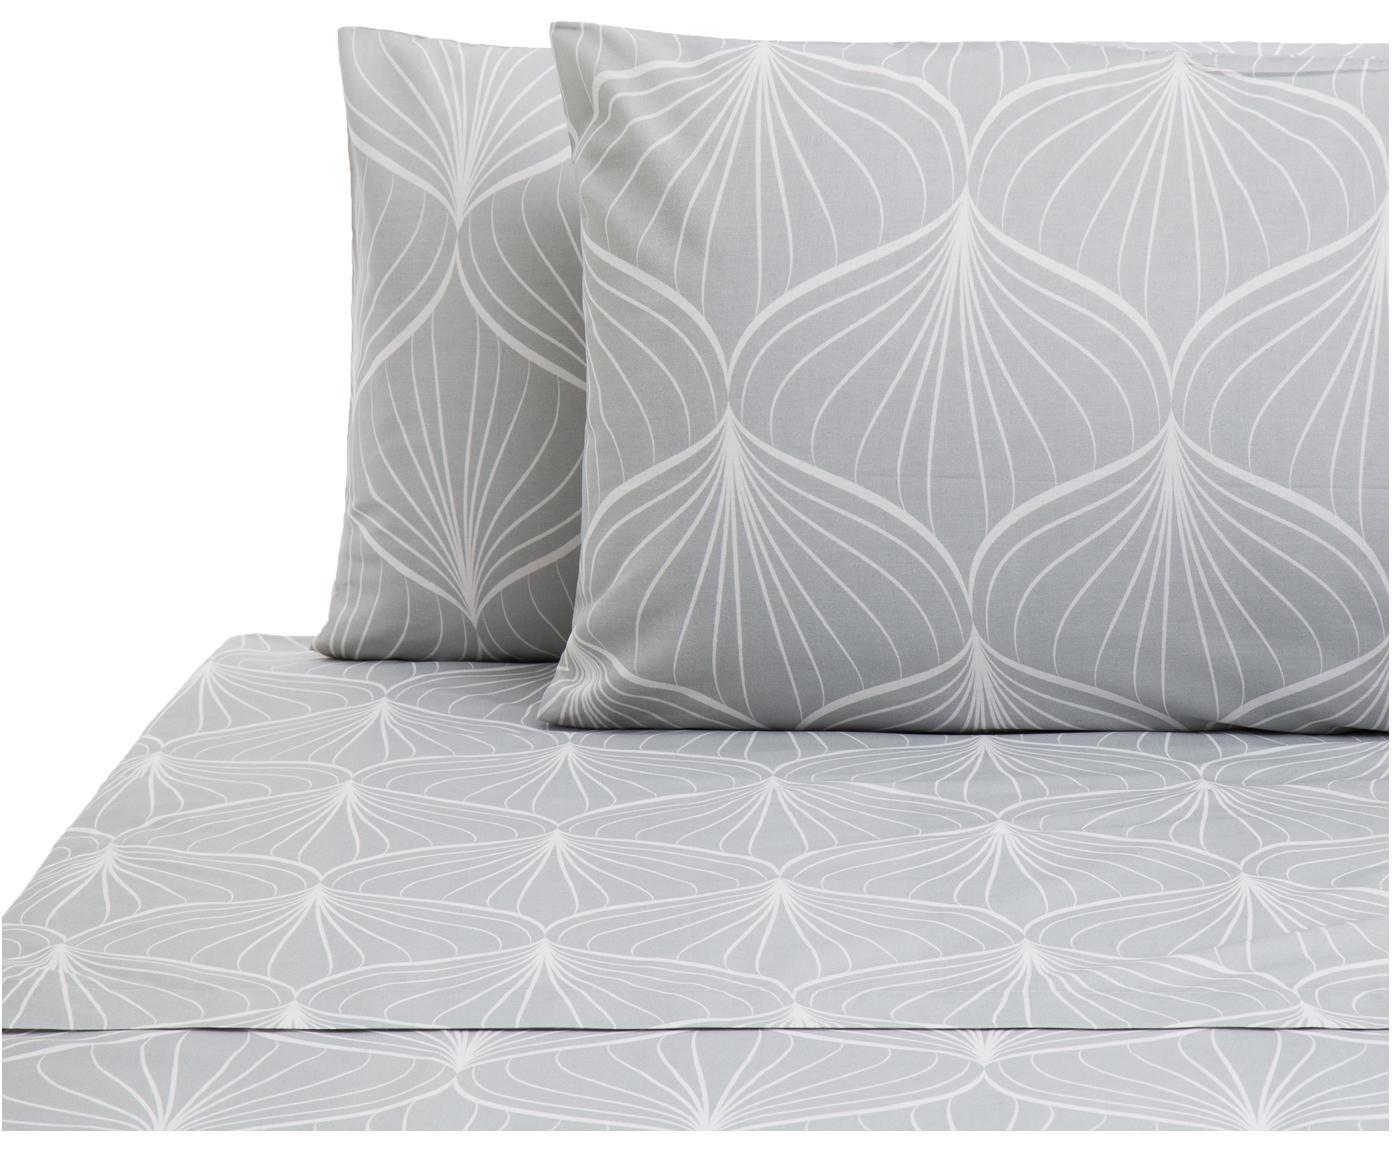 Set lenzuola in cotone Rama 2 pz, Cotone, Grigio, bianco, 240 x 270 cm